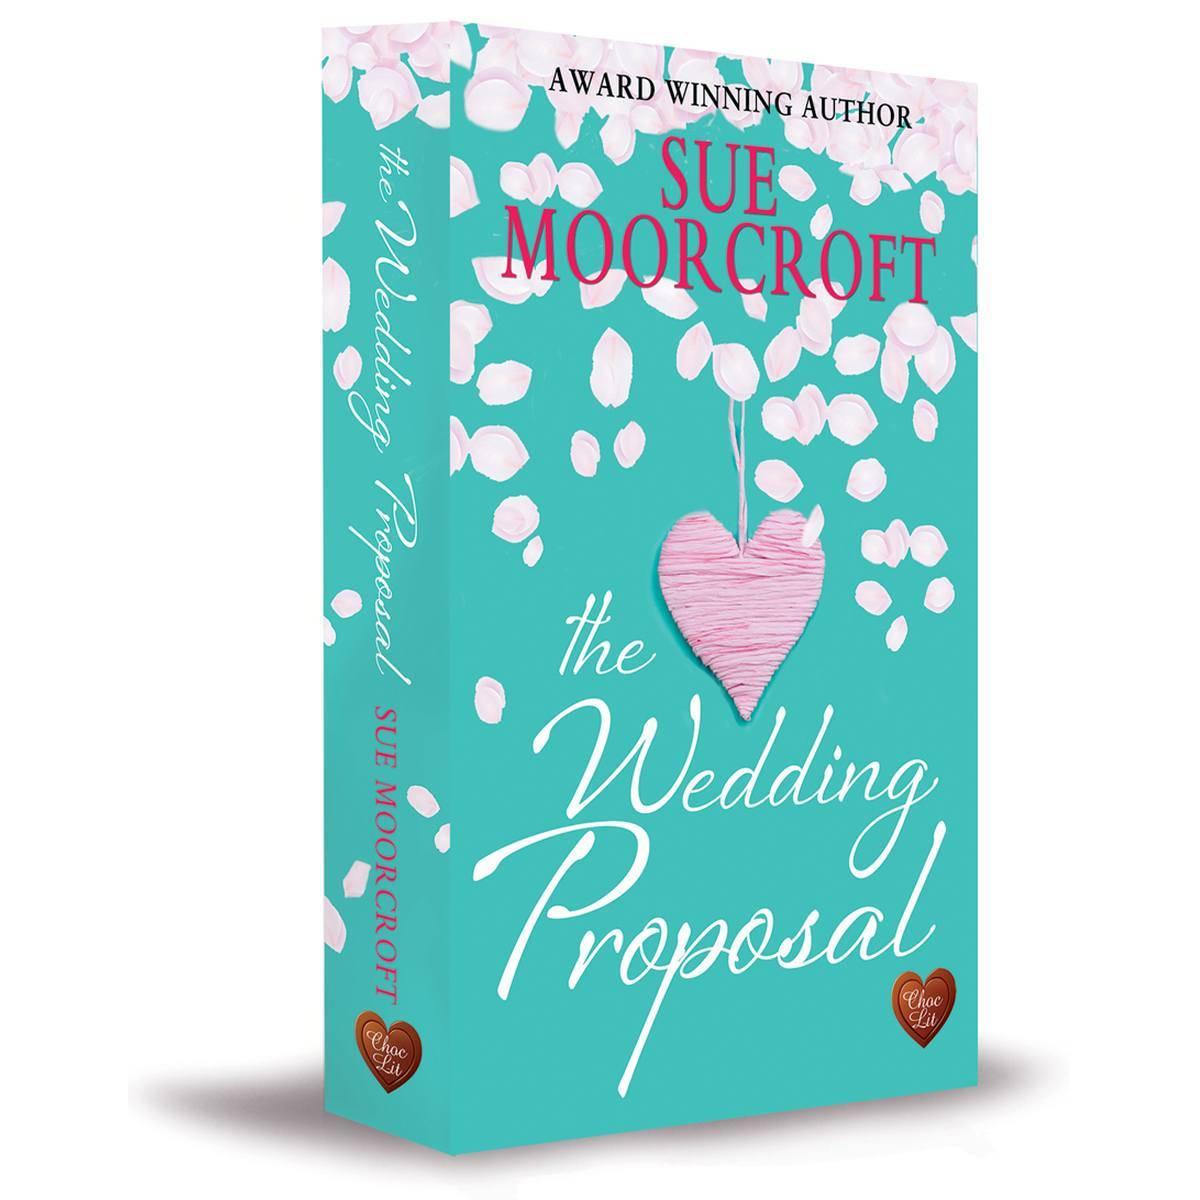 Image of The Wedding Proposal